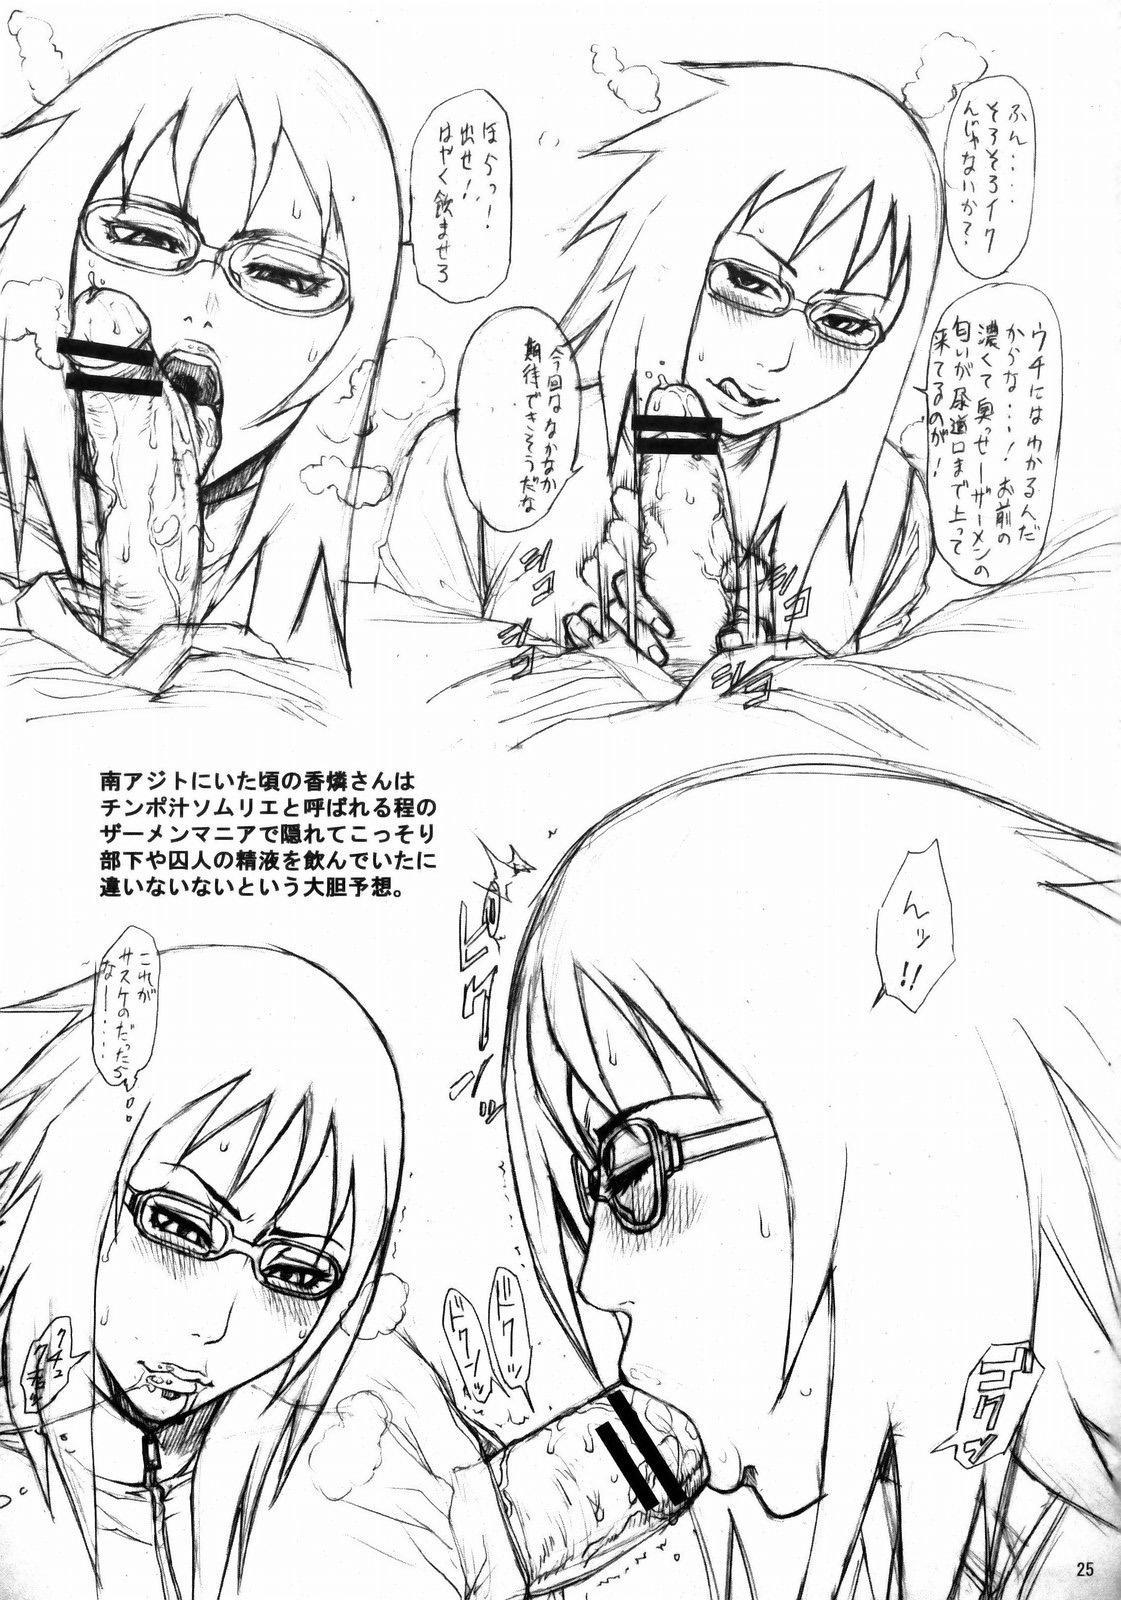 NINJA EXTREME 3 Onna Goroshi Shippuuden 23